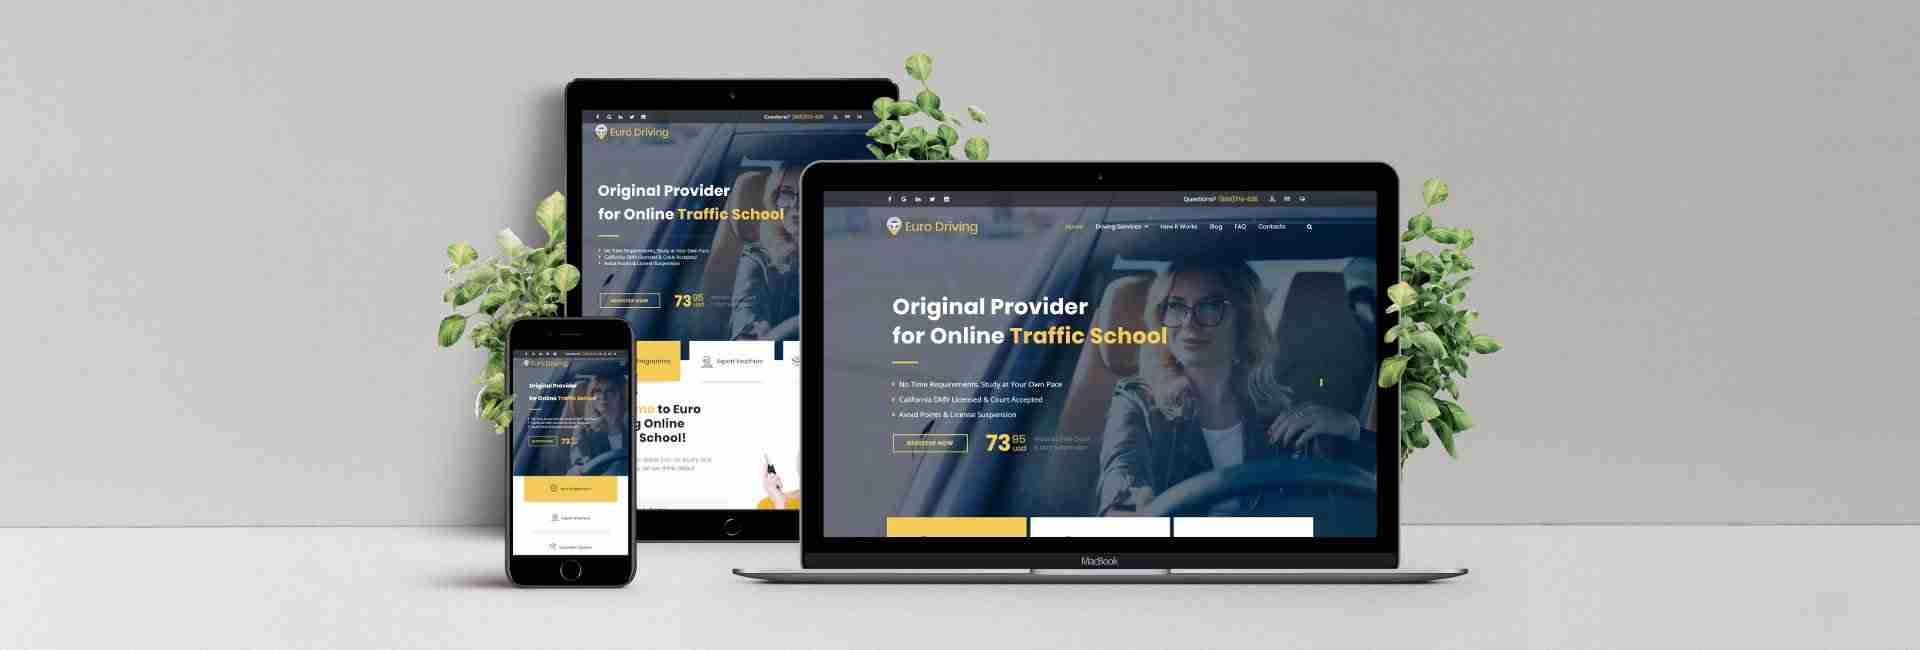 Web Design & Development for Euro Driving